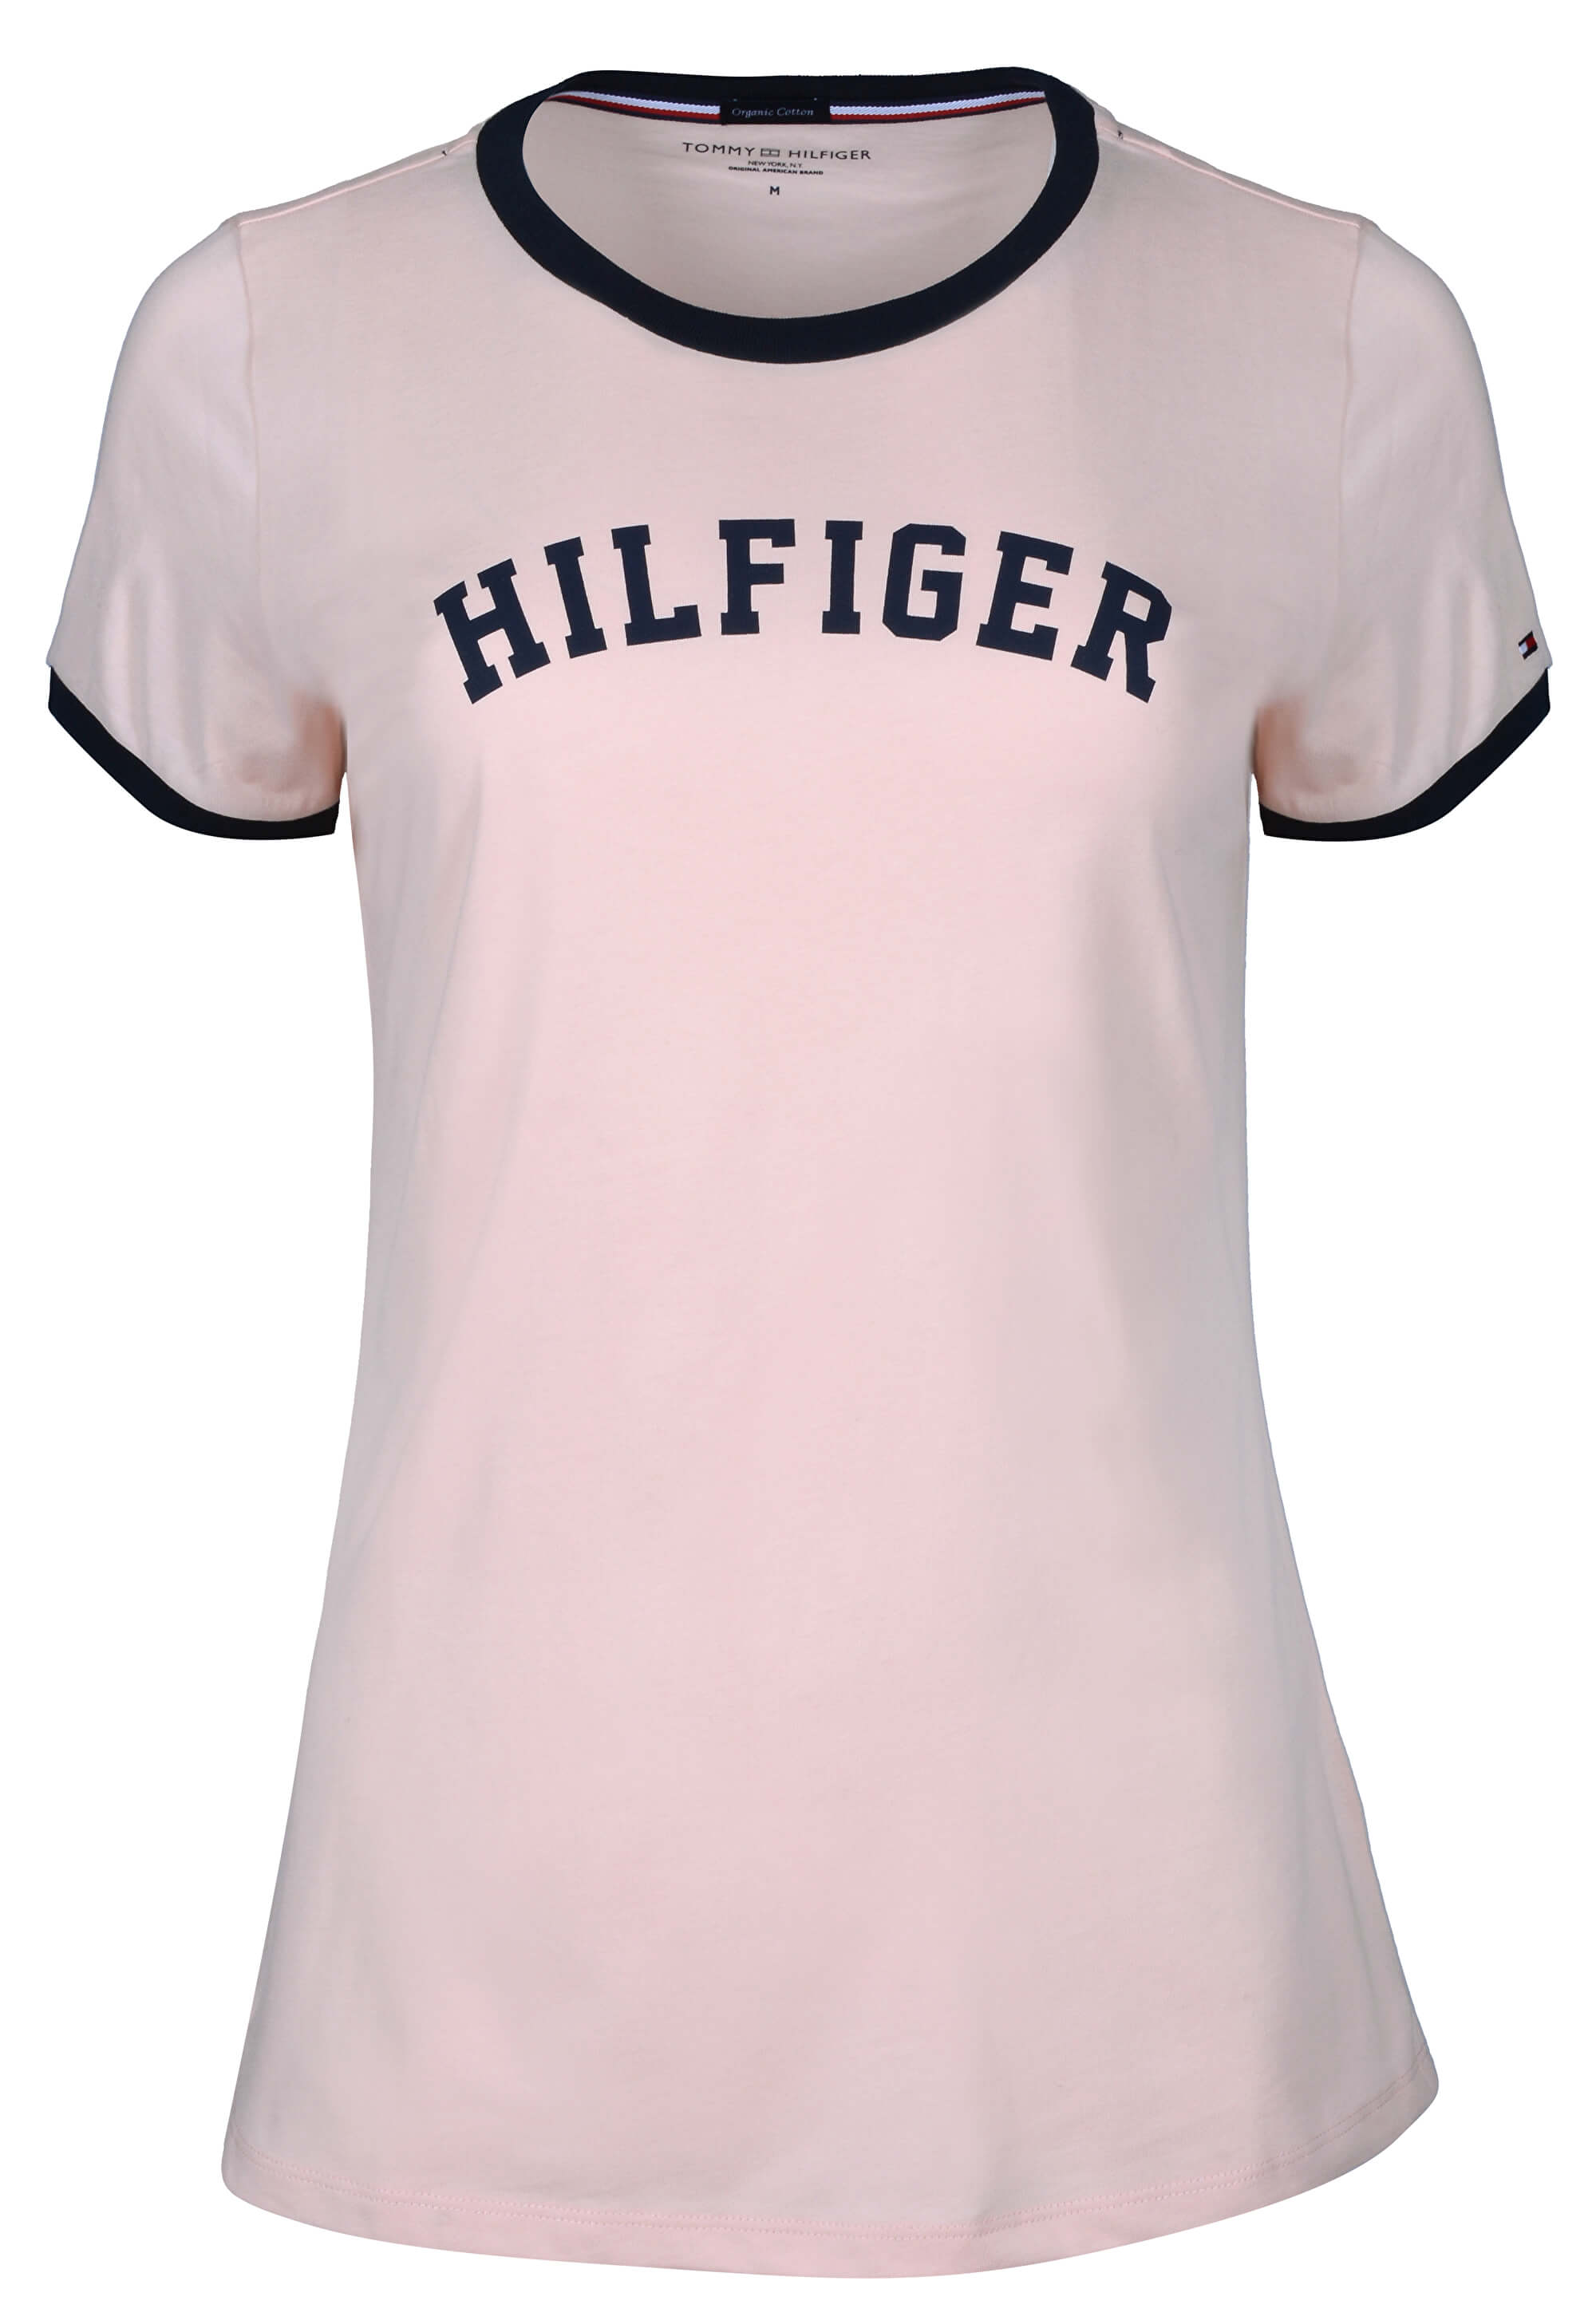 Tommy Hilfiger Dámske tričko Bold   Cotton Icon ic Ss Tee Print Pale Blush  UW0UW00091 - 1528293c3f1